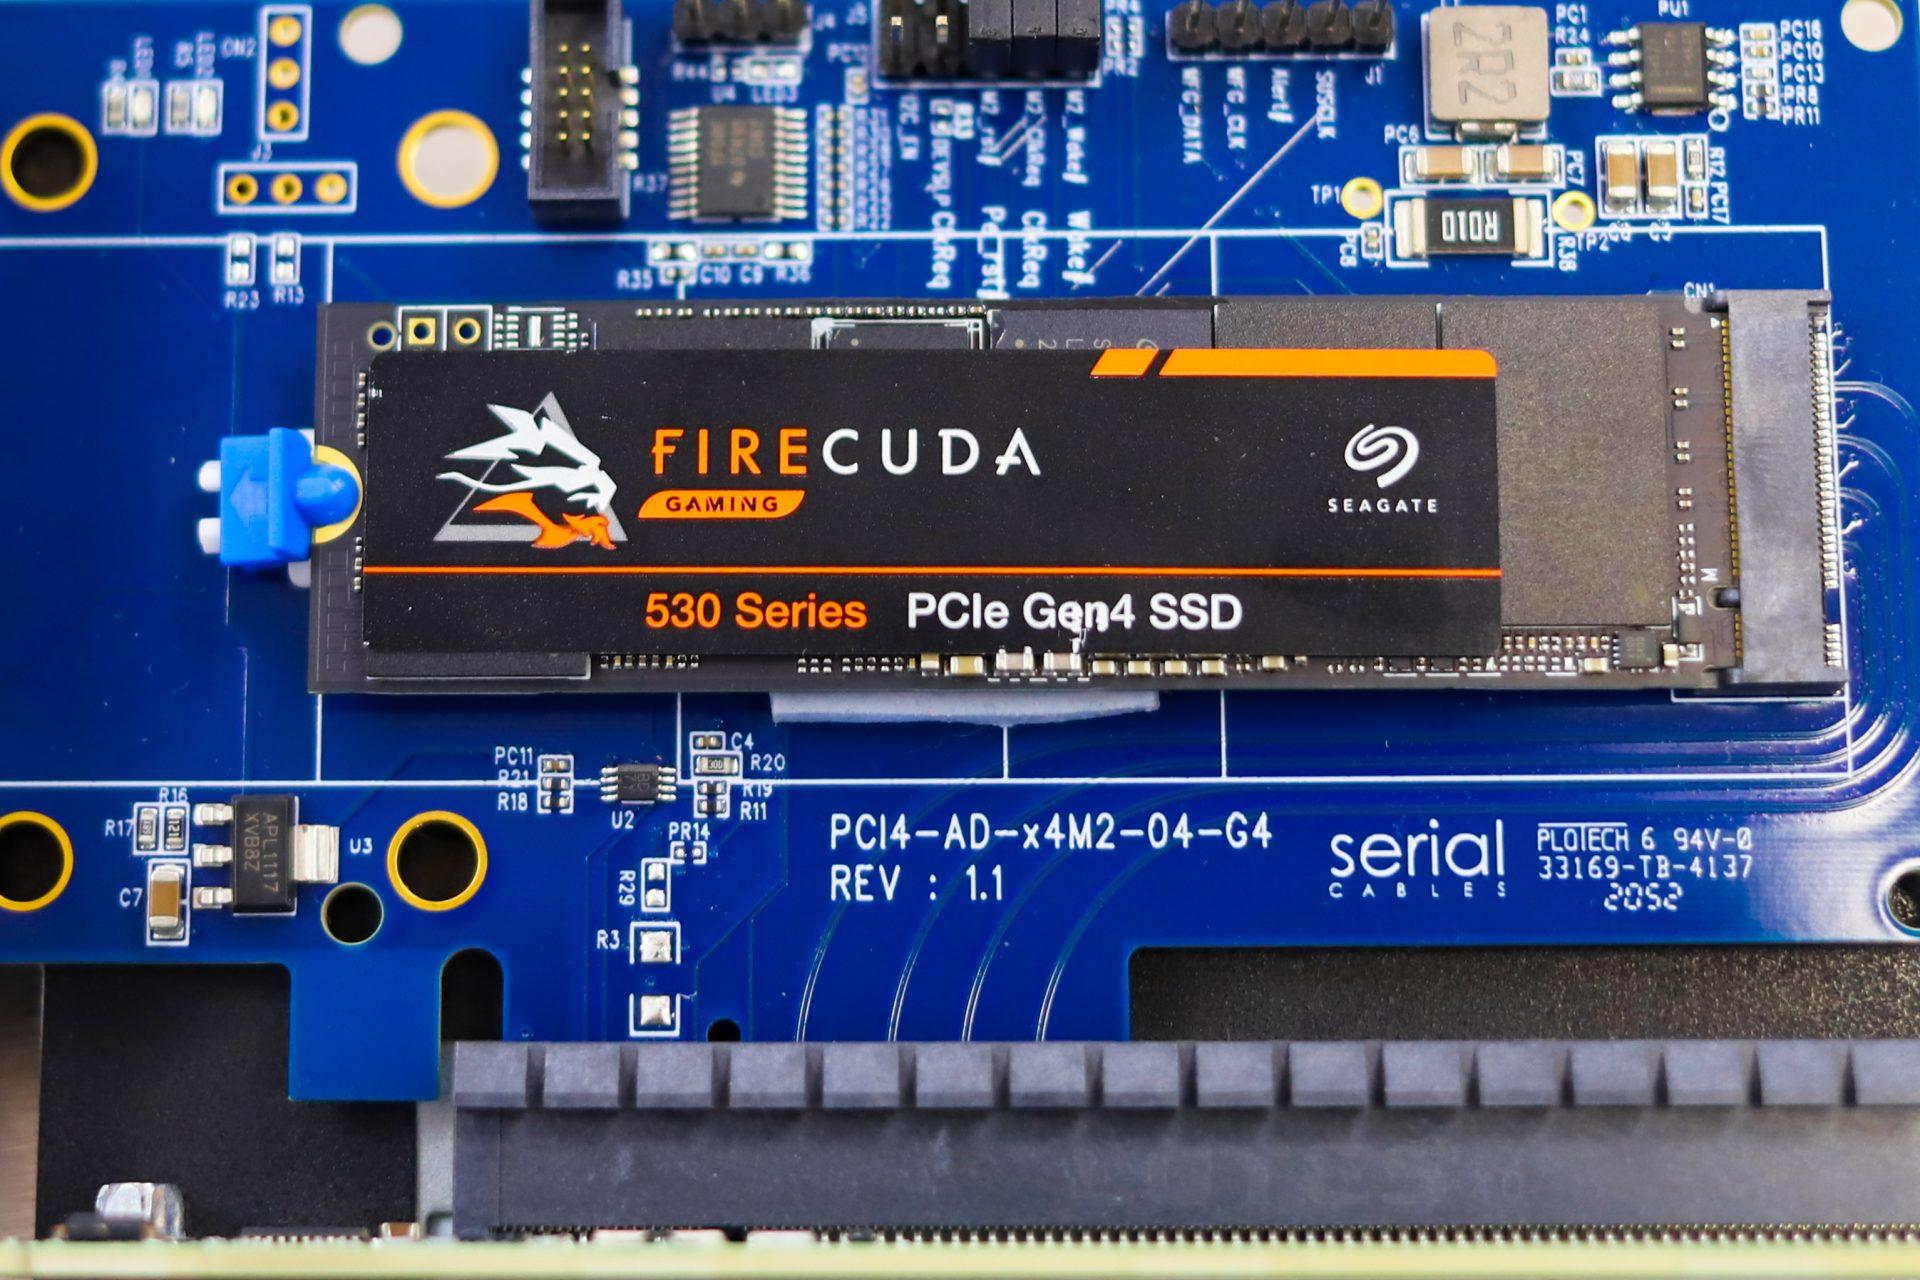 Seagate FireCuda 530 SSD in server